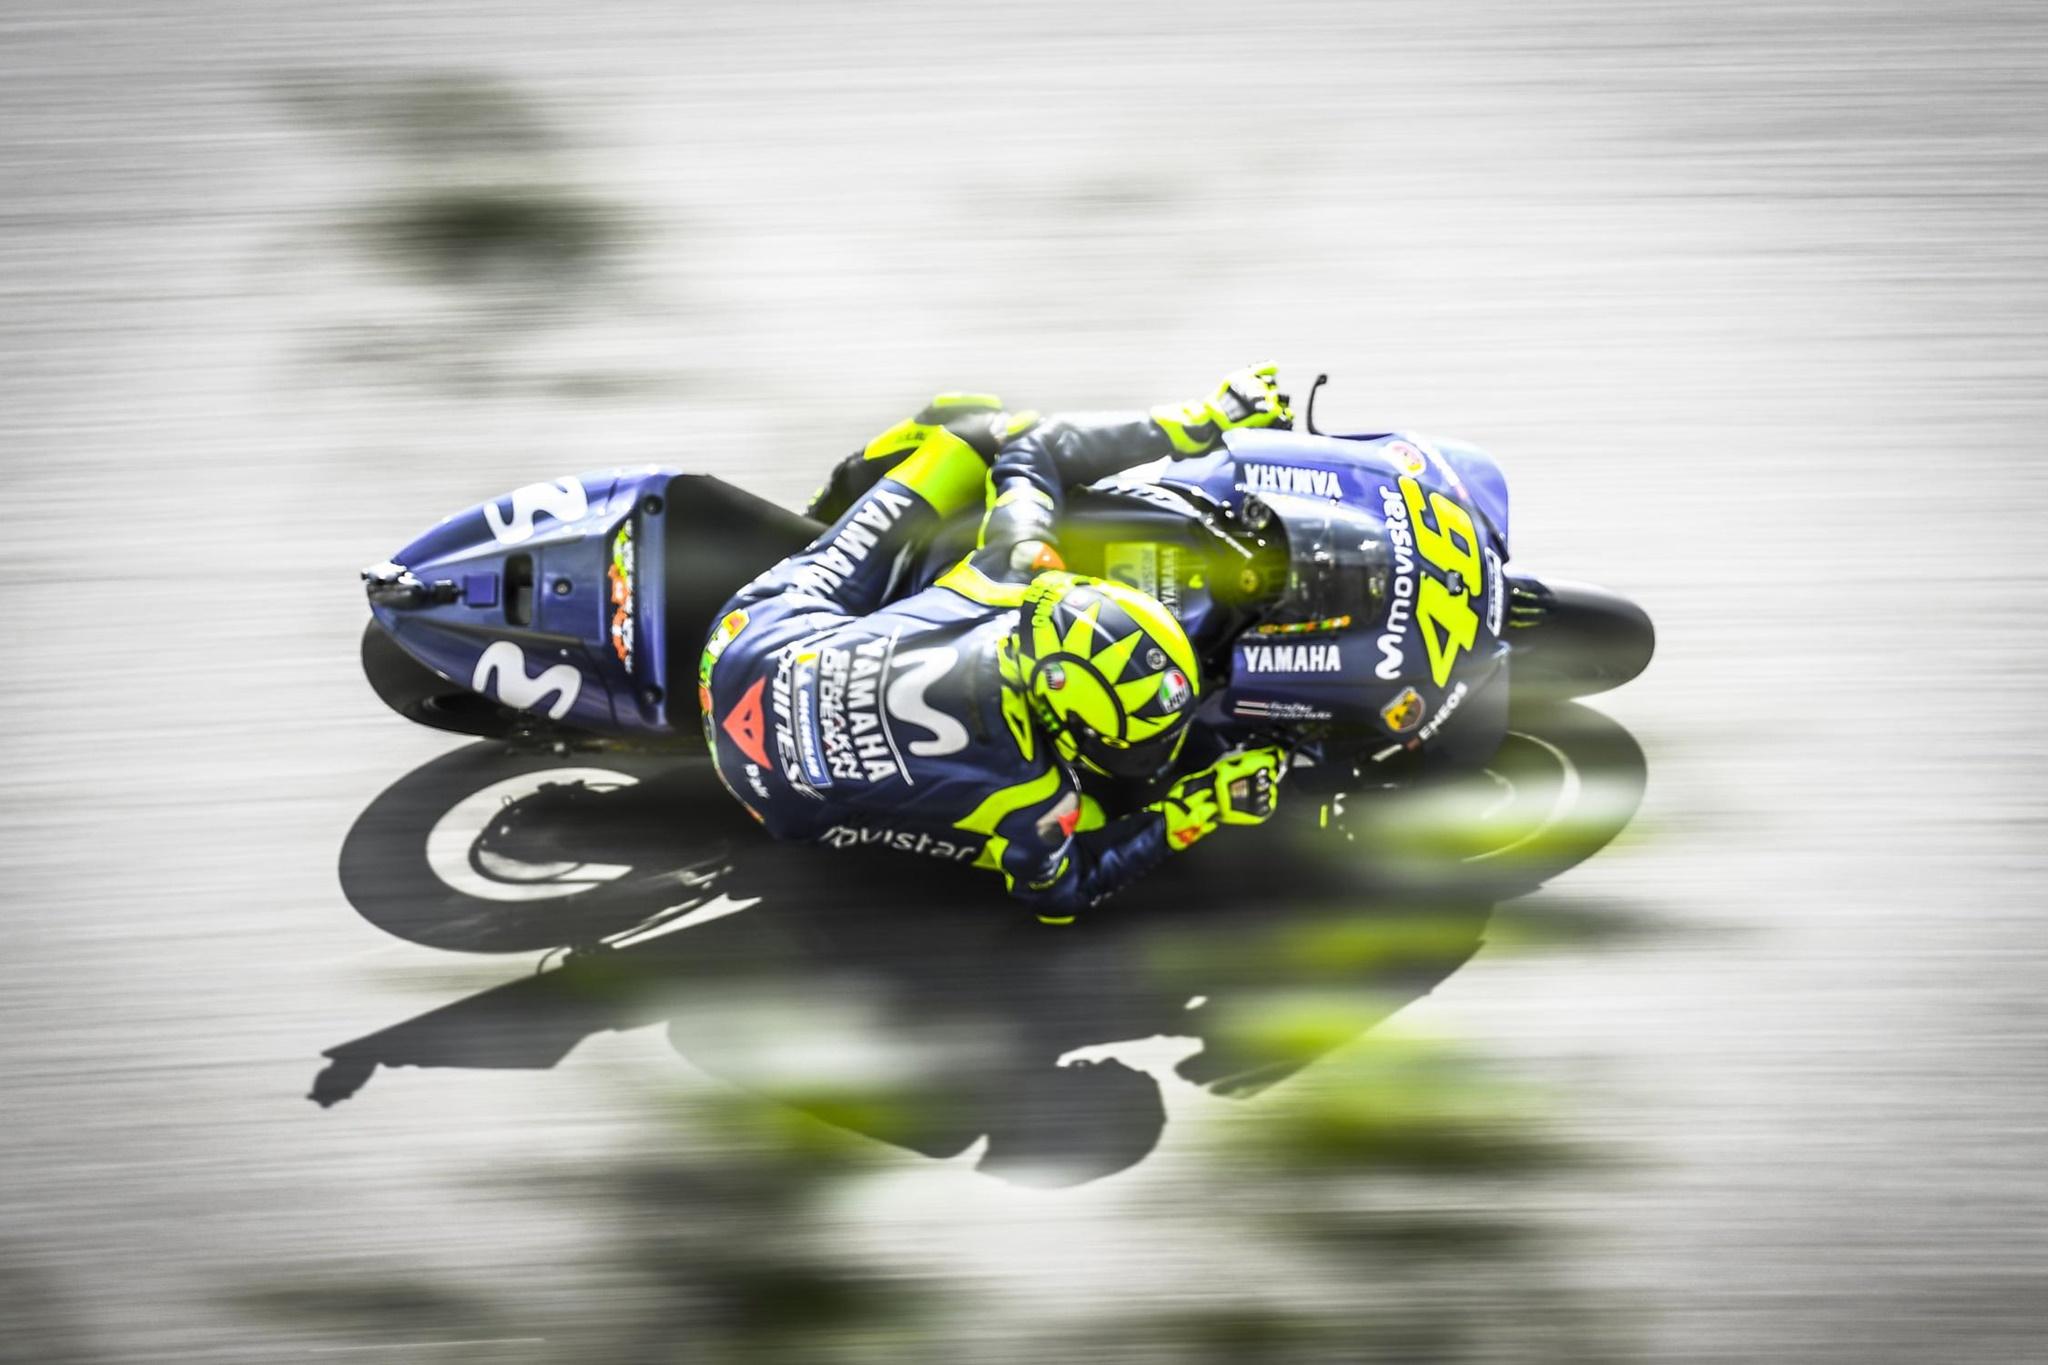 MotoGP18_GermanGP_2018_Xe_Tinhte-001.jpg